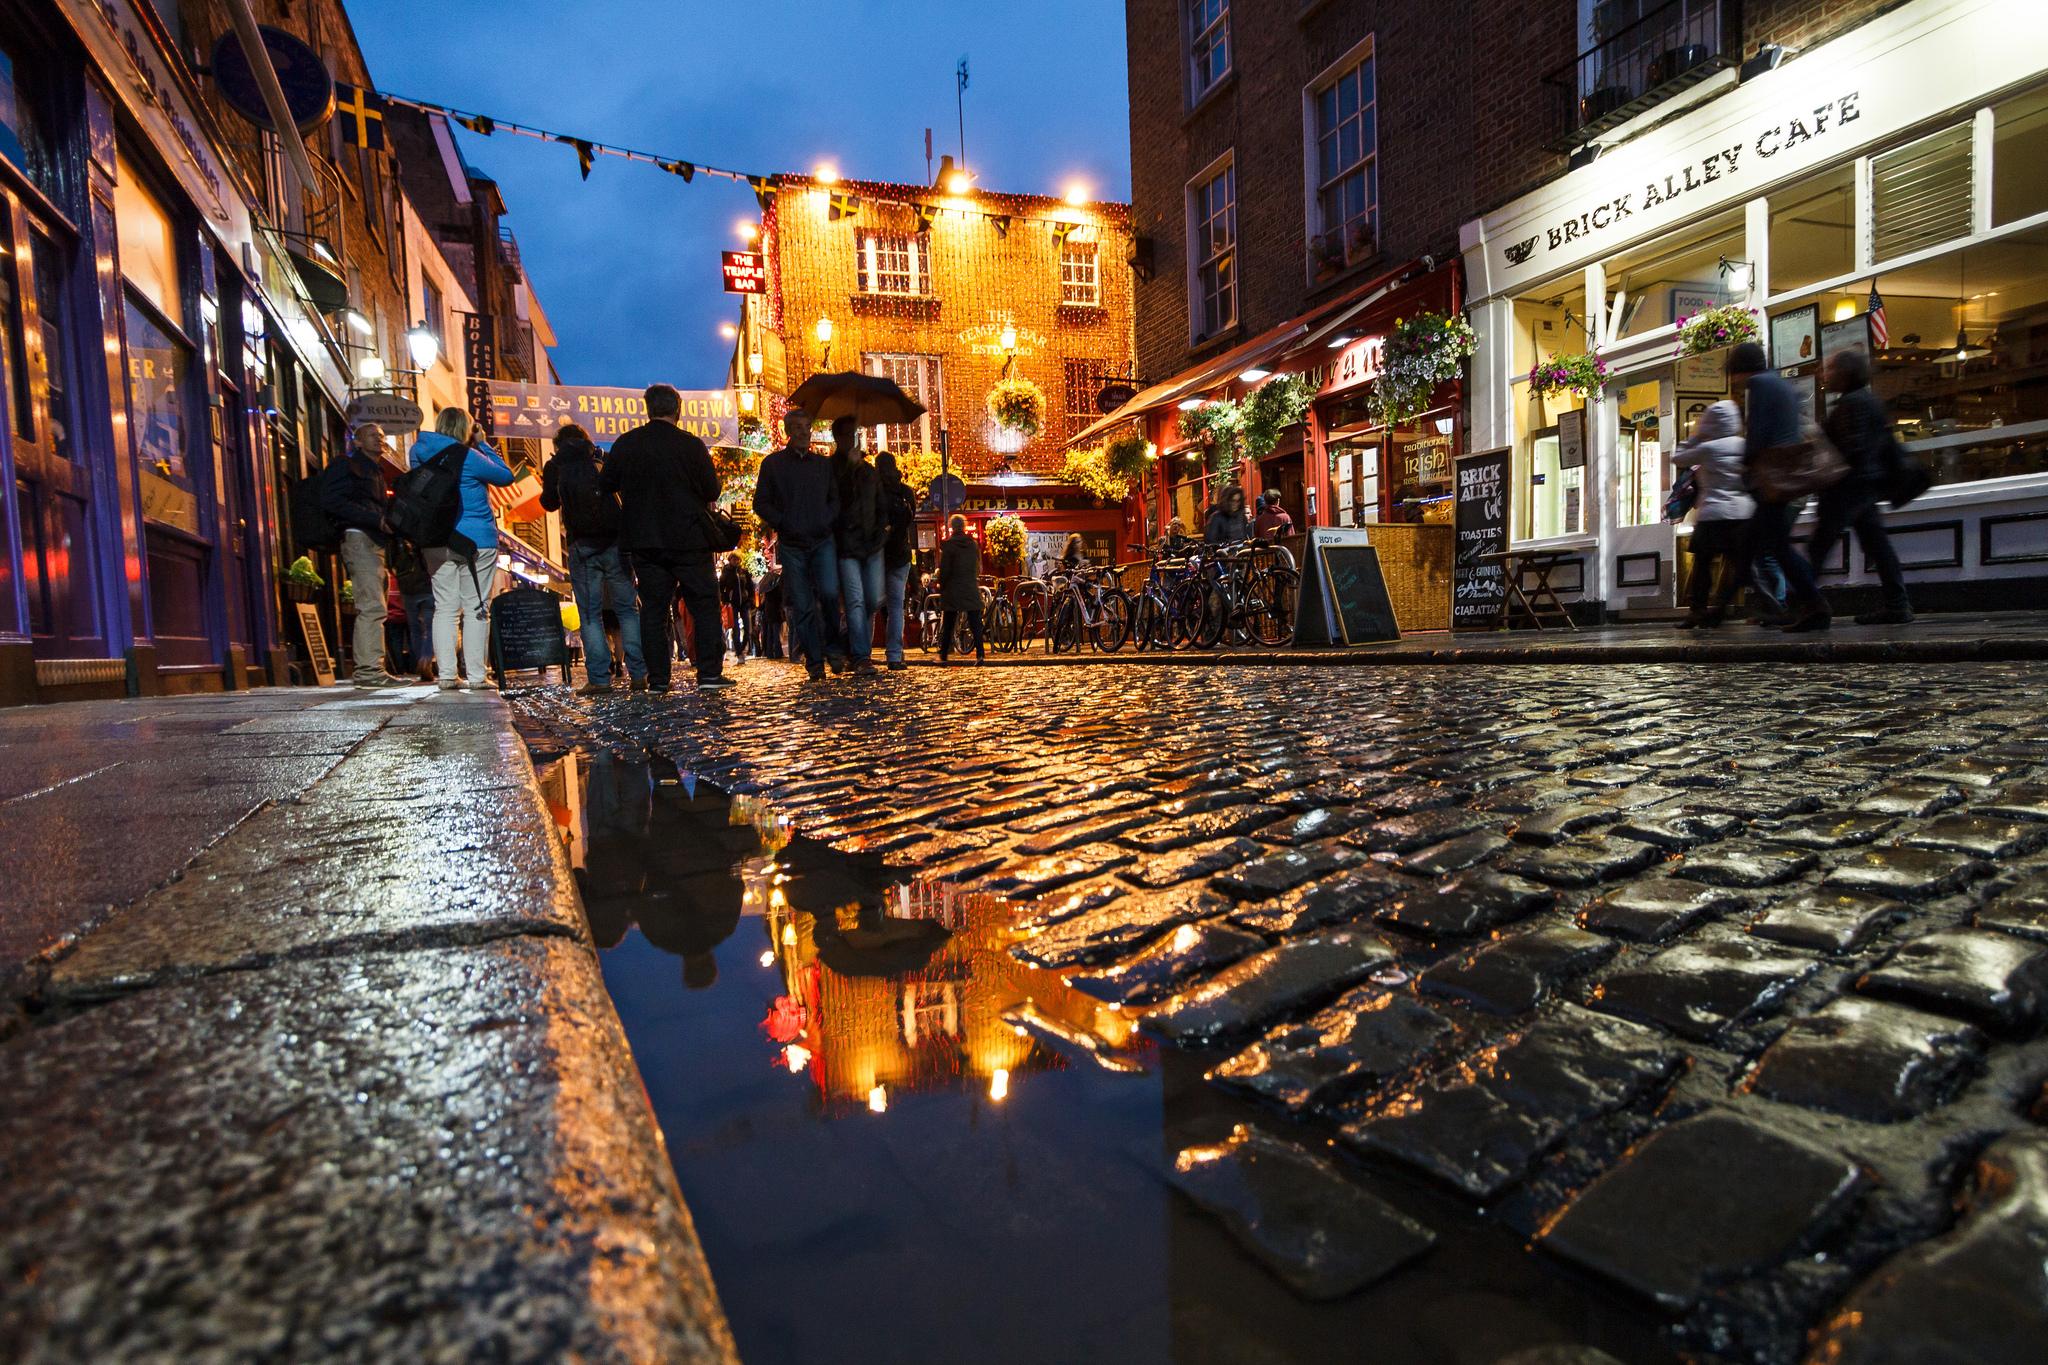 Brick Alley Cafe, Темпл-Бар, Дублин